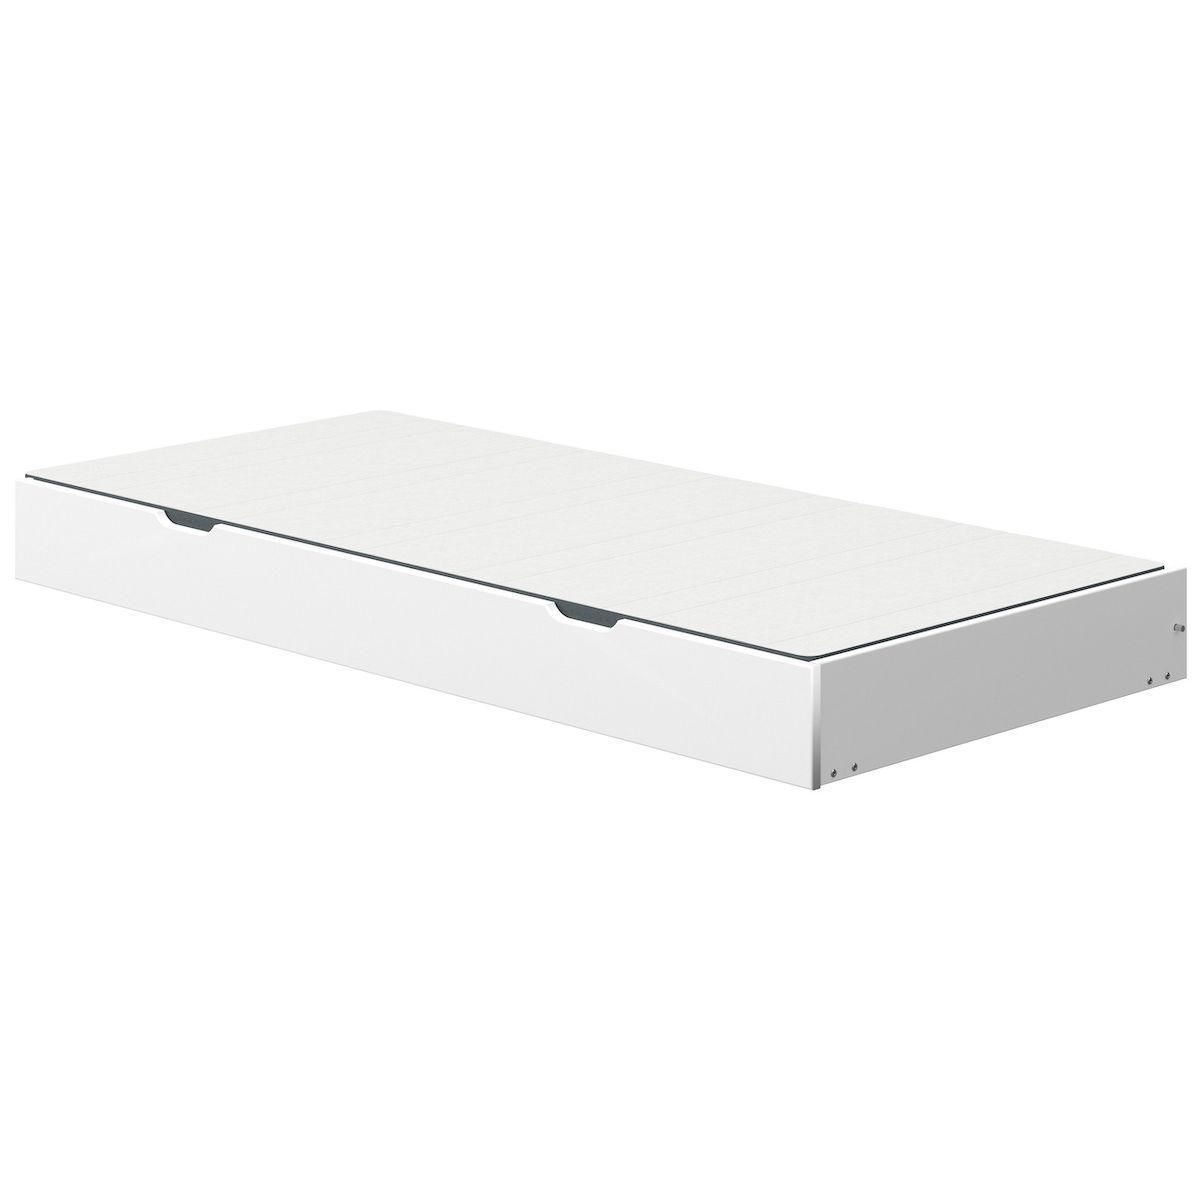 Lit gigogne roulettes-pieds 90x190cm WHITE Flexa blanc